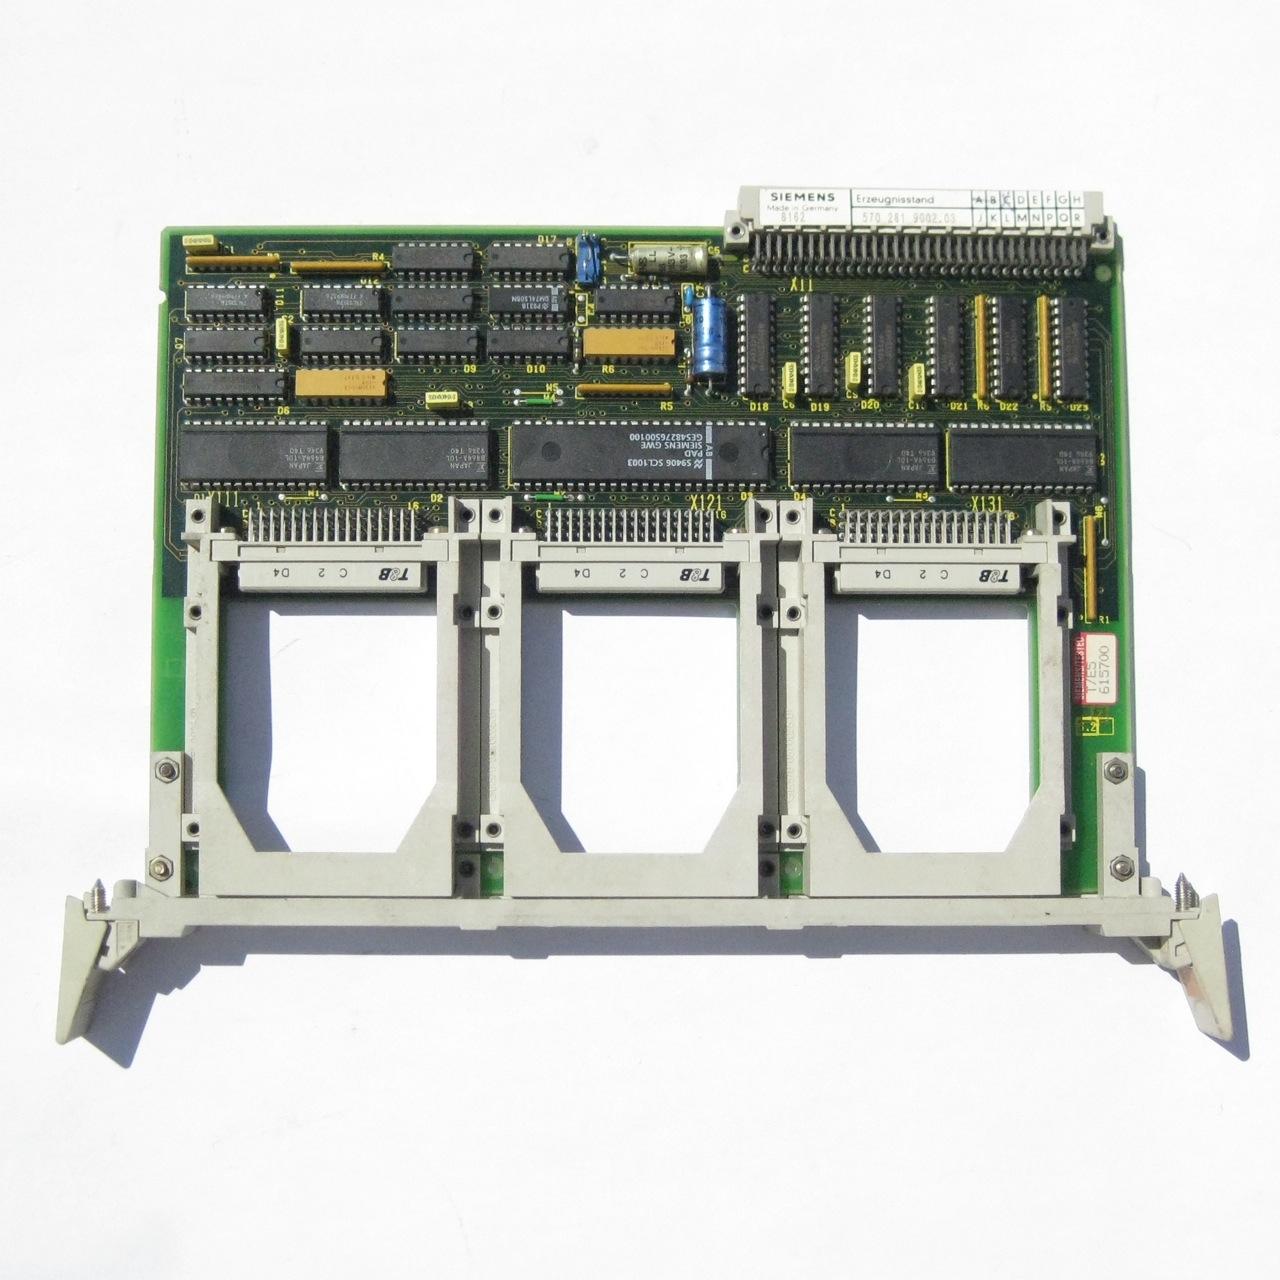 Siemens 6FX1128-1BB00 Memory Module